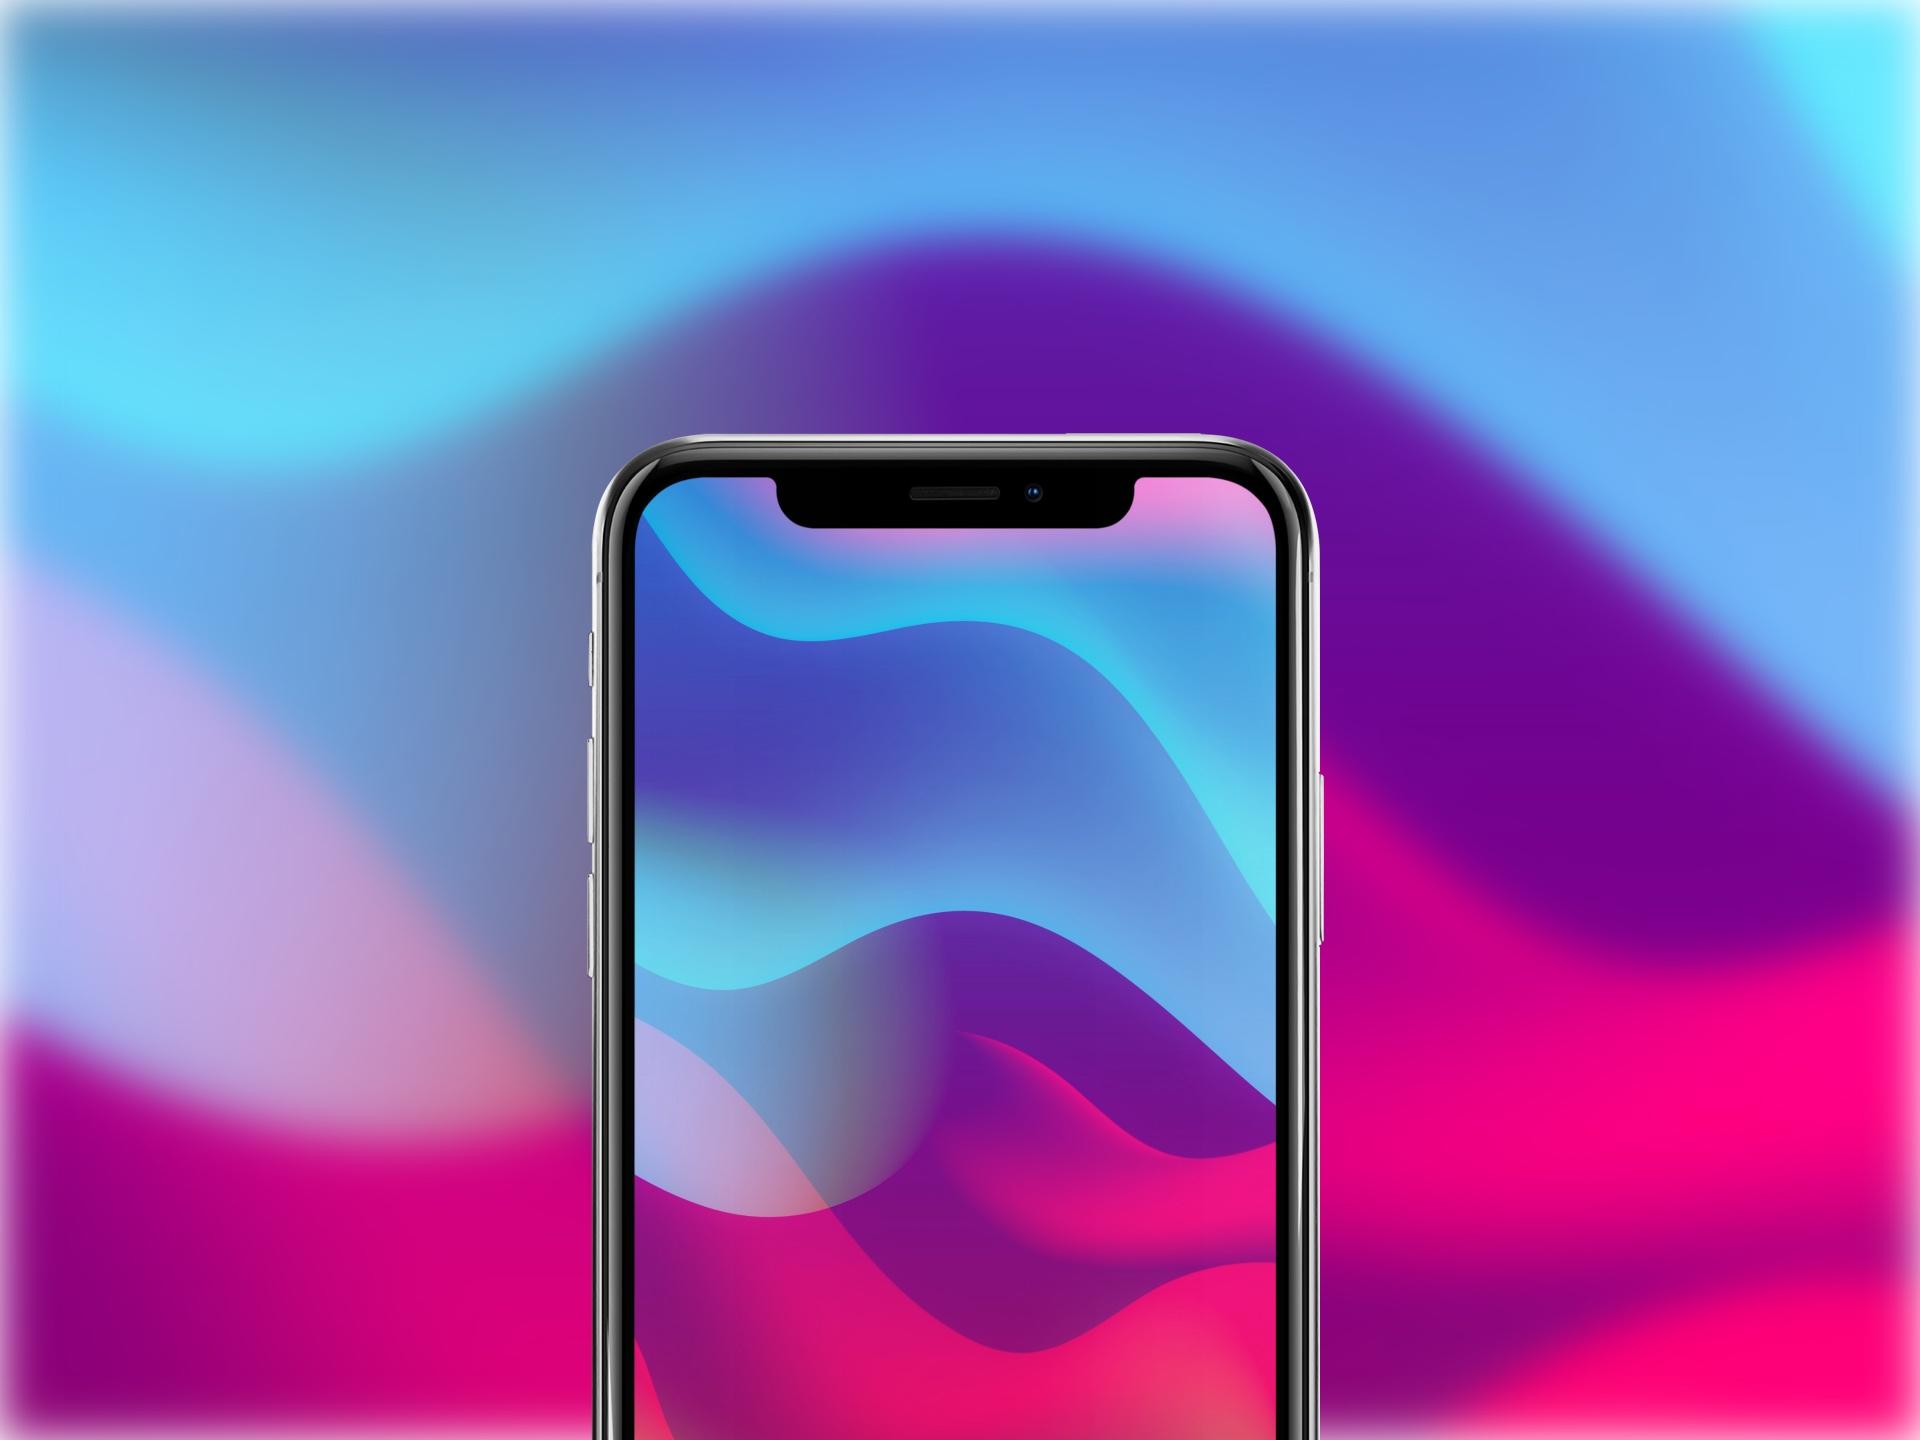 Top 10 Iphone Wallpapers Of 2019